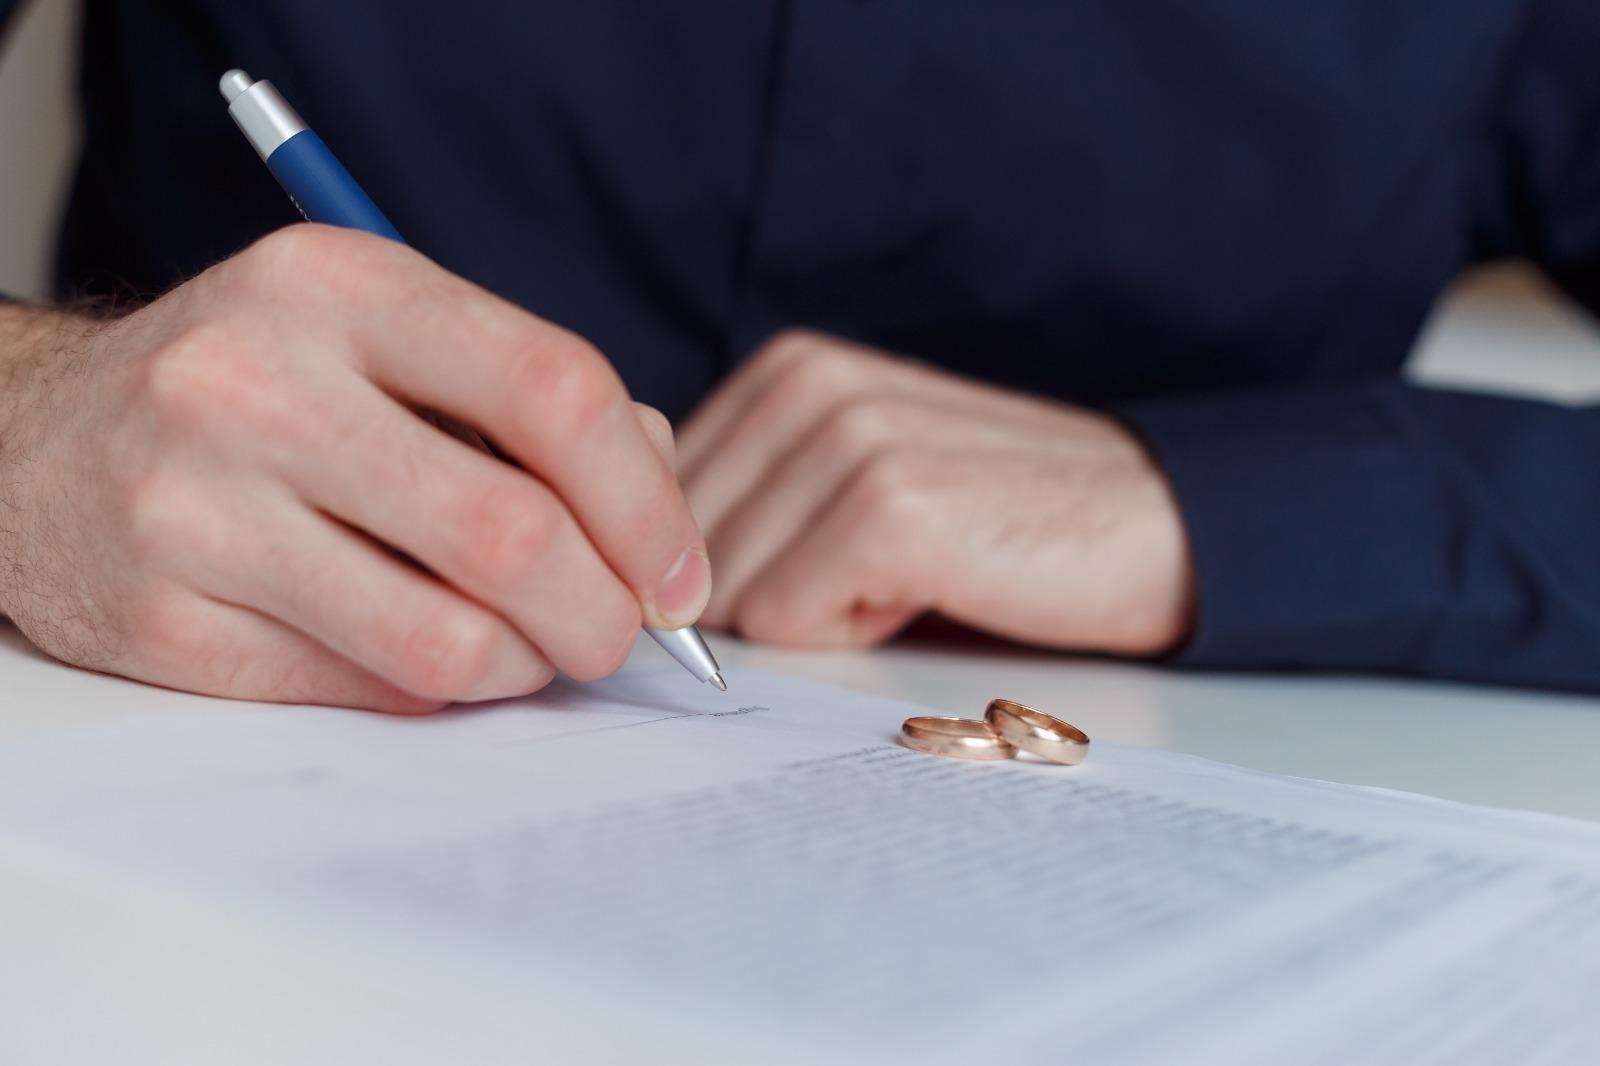 Boşanmalarda Mal Paylaşım Davası